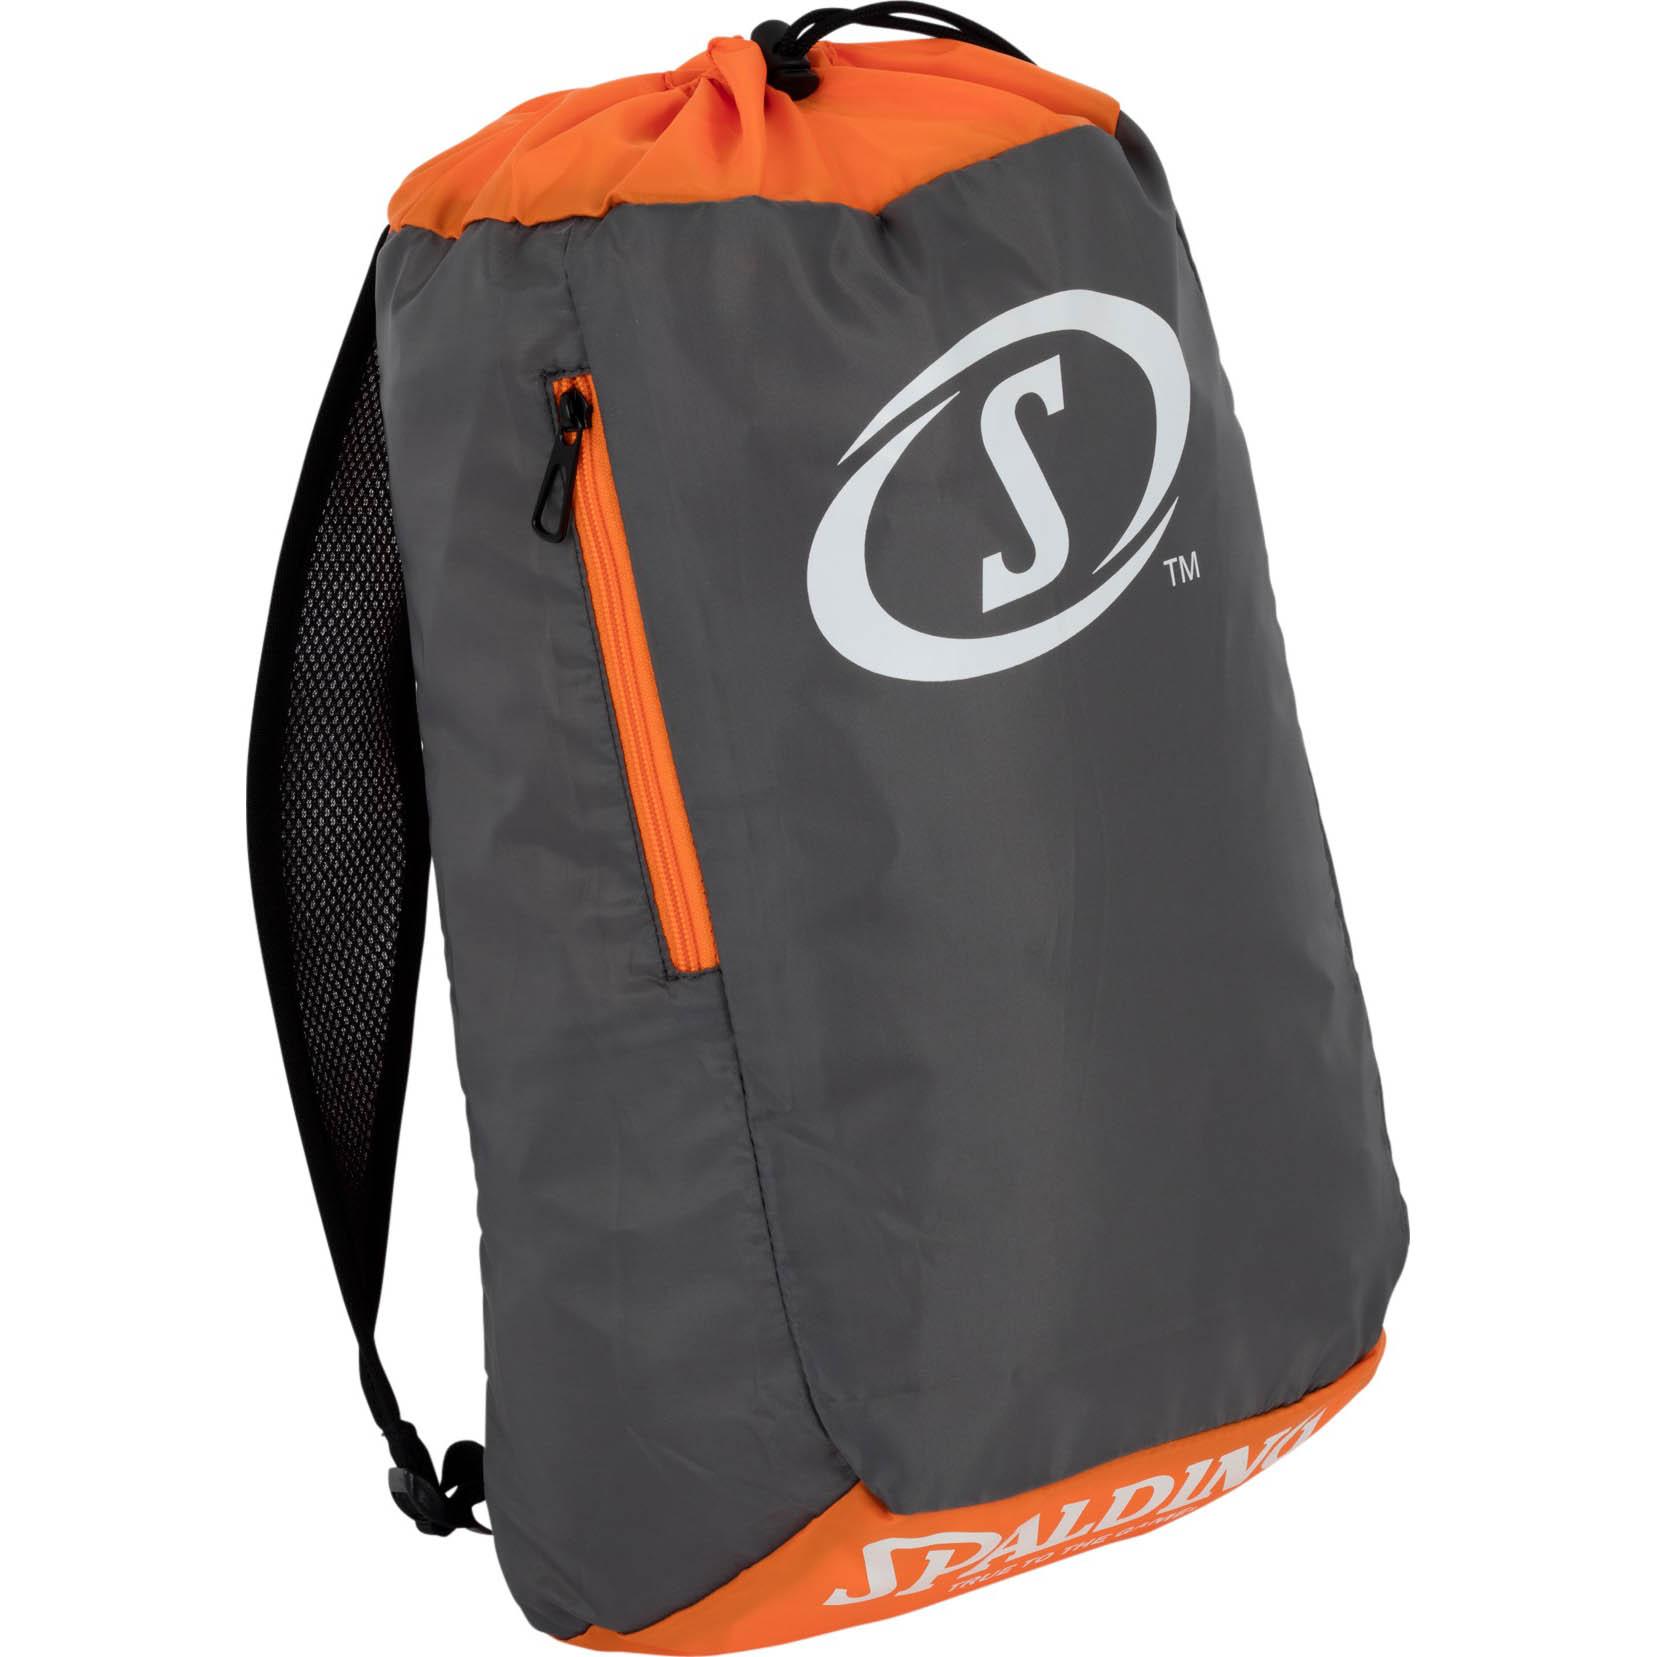 Spalding Sackpack Adult - Grey/Orange